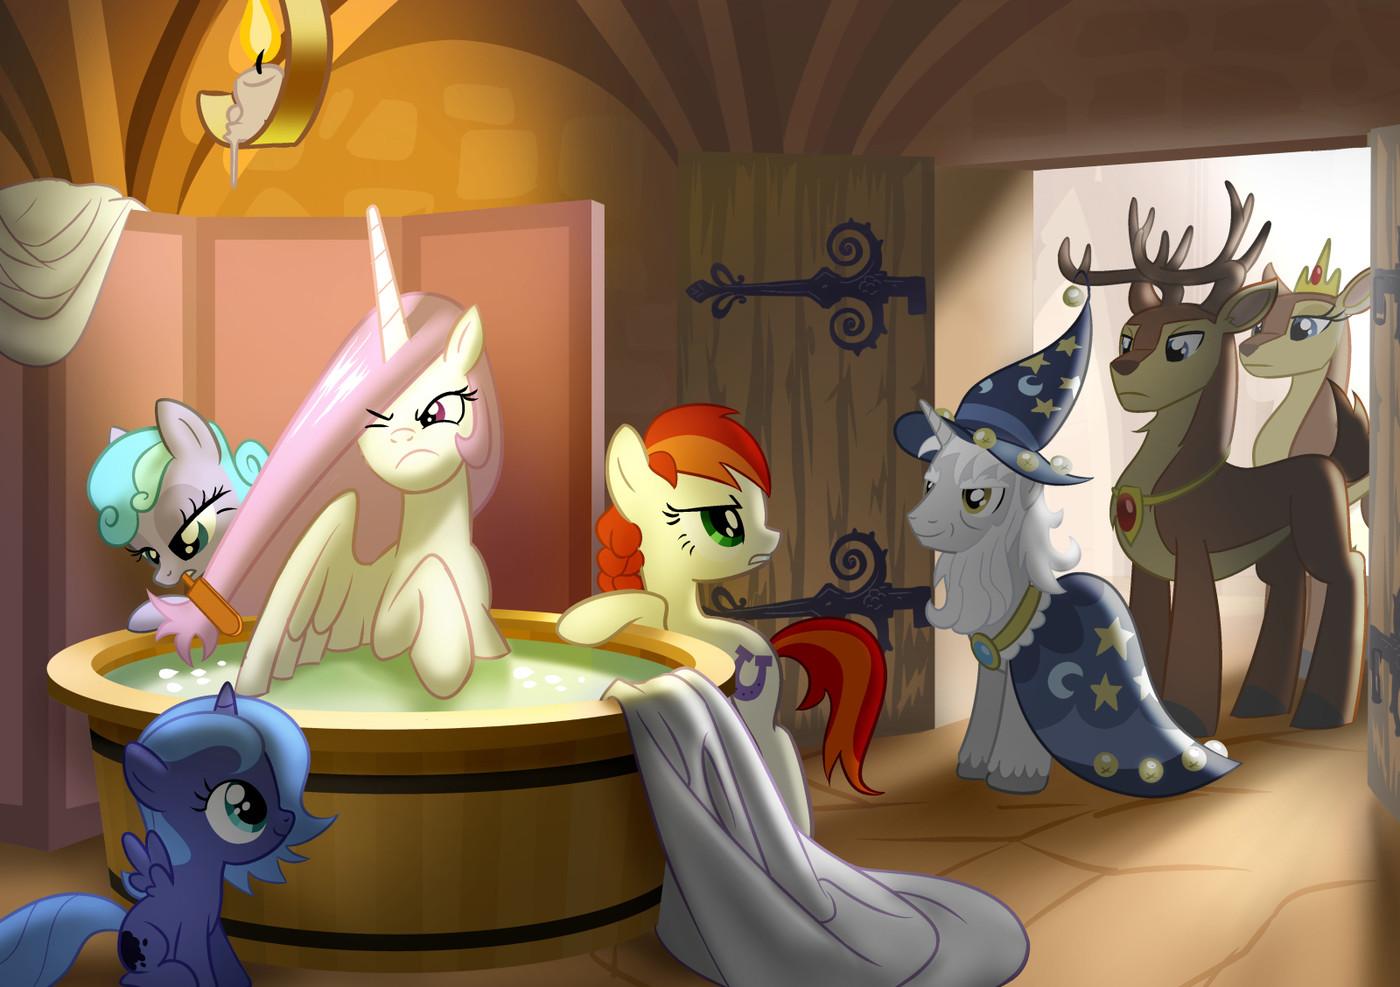 Original Character Princess Celestia Princess Luna And